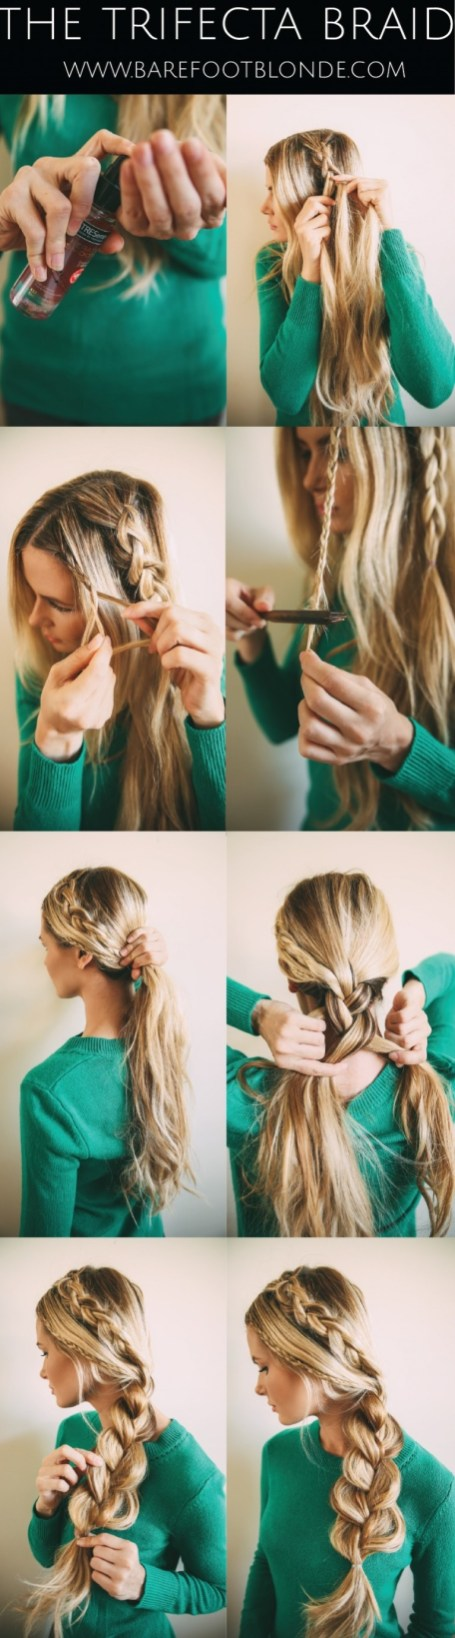 Hair Tutorials For Long Hair In Spring & Summer Season 13